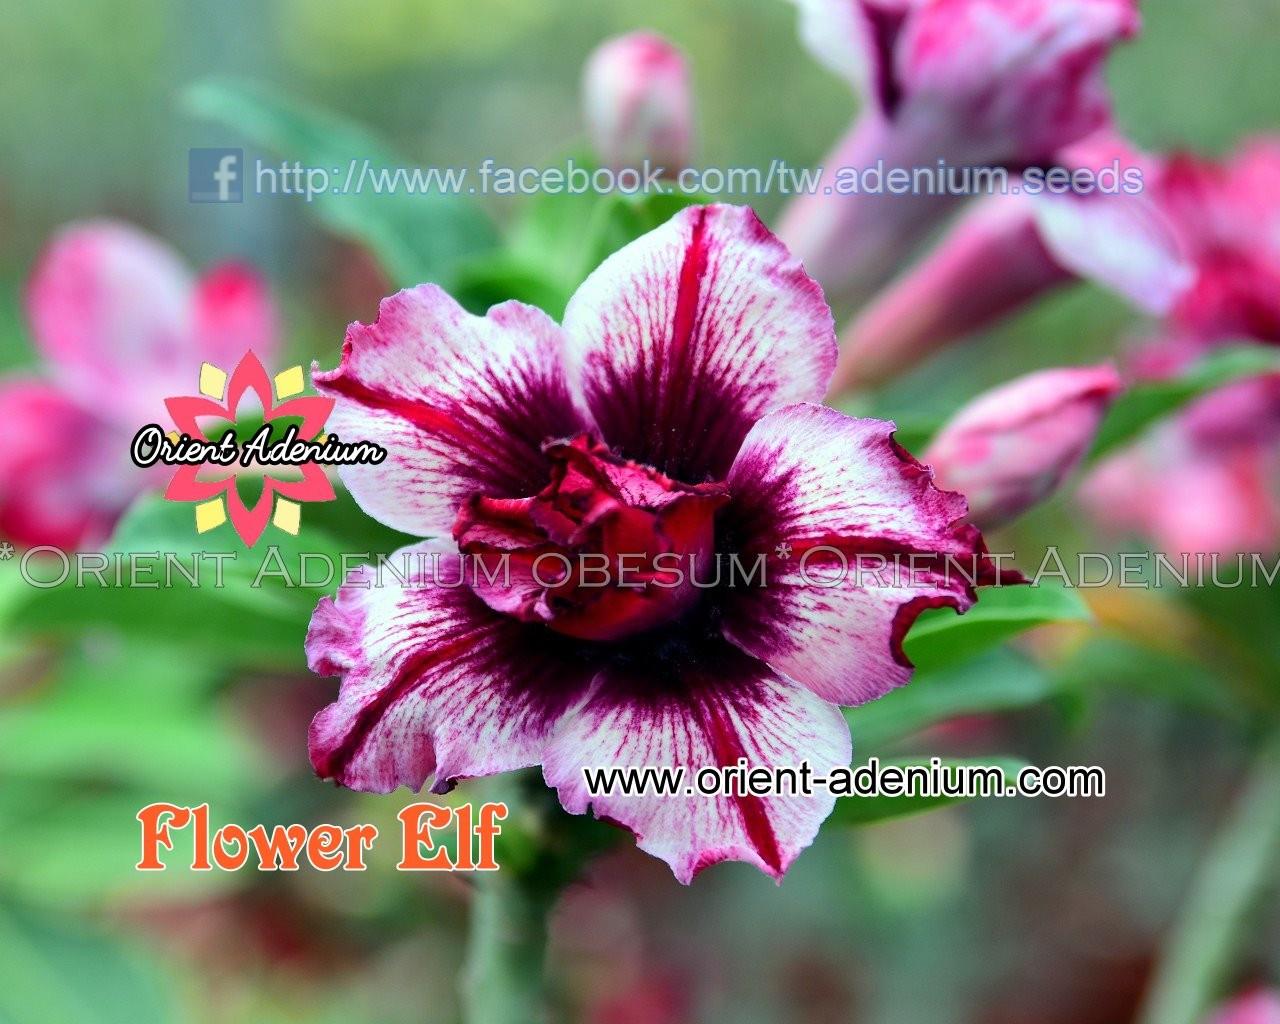 Прививка Flower Elf